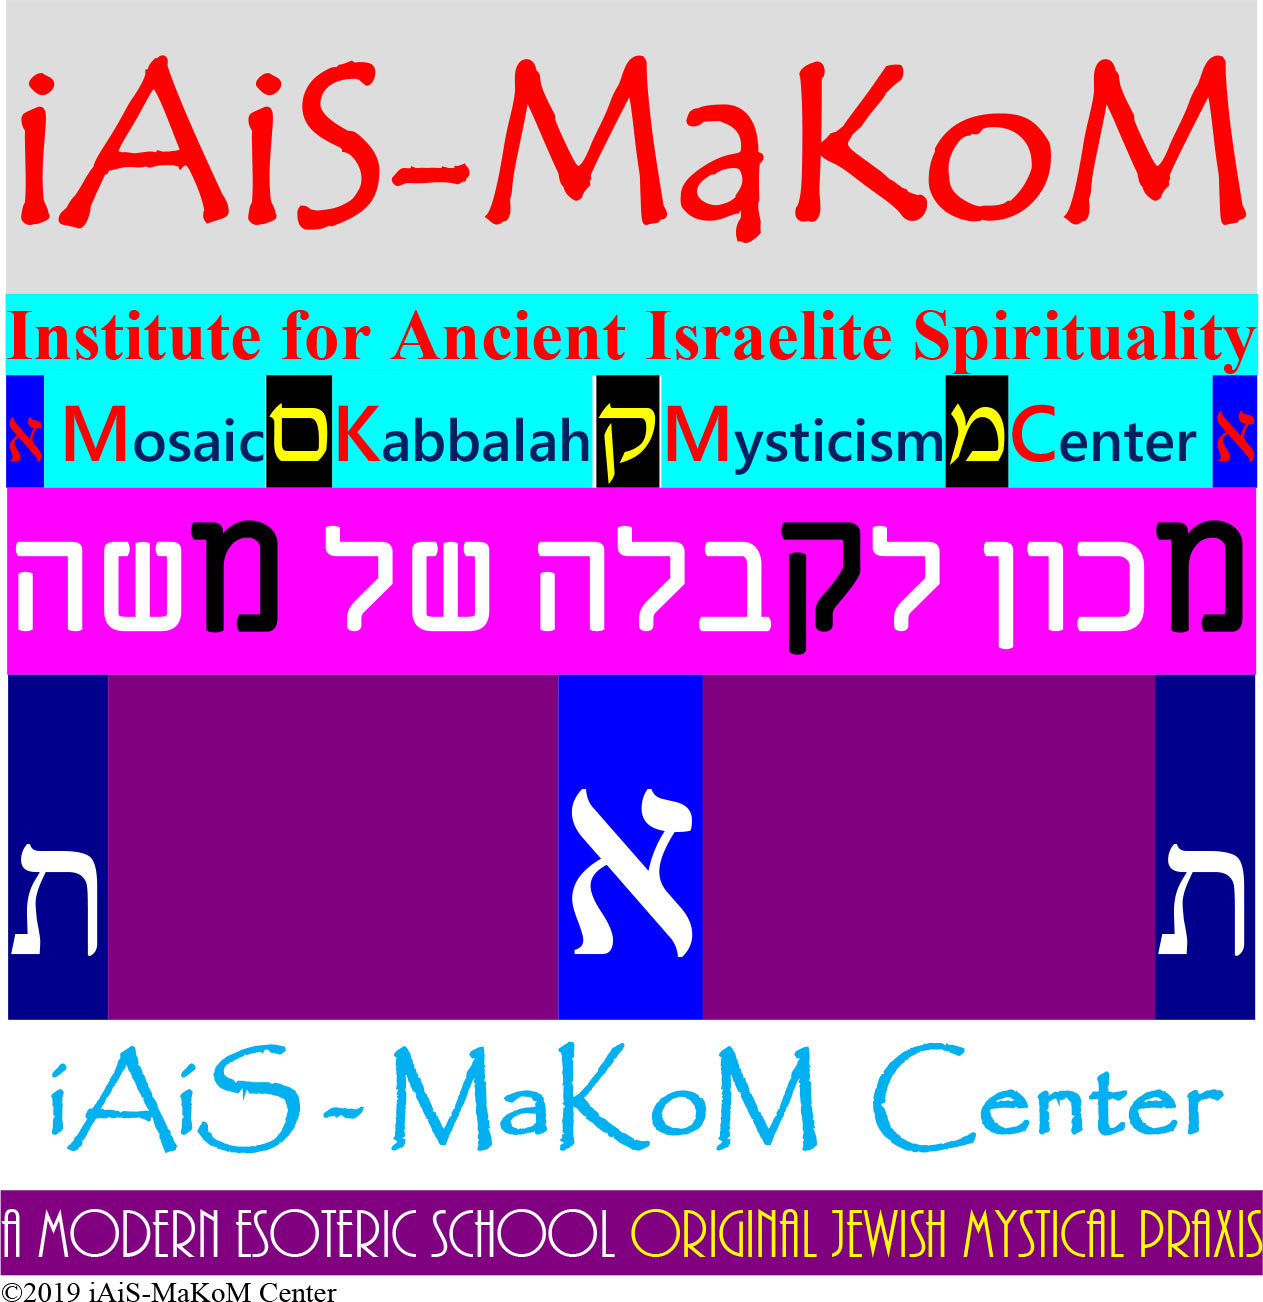 Institute for Ancient Israelite Spirituality - Jewish Spiritual Retreat Center